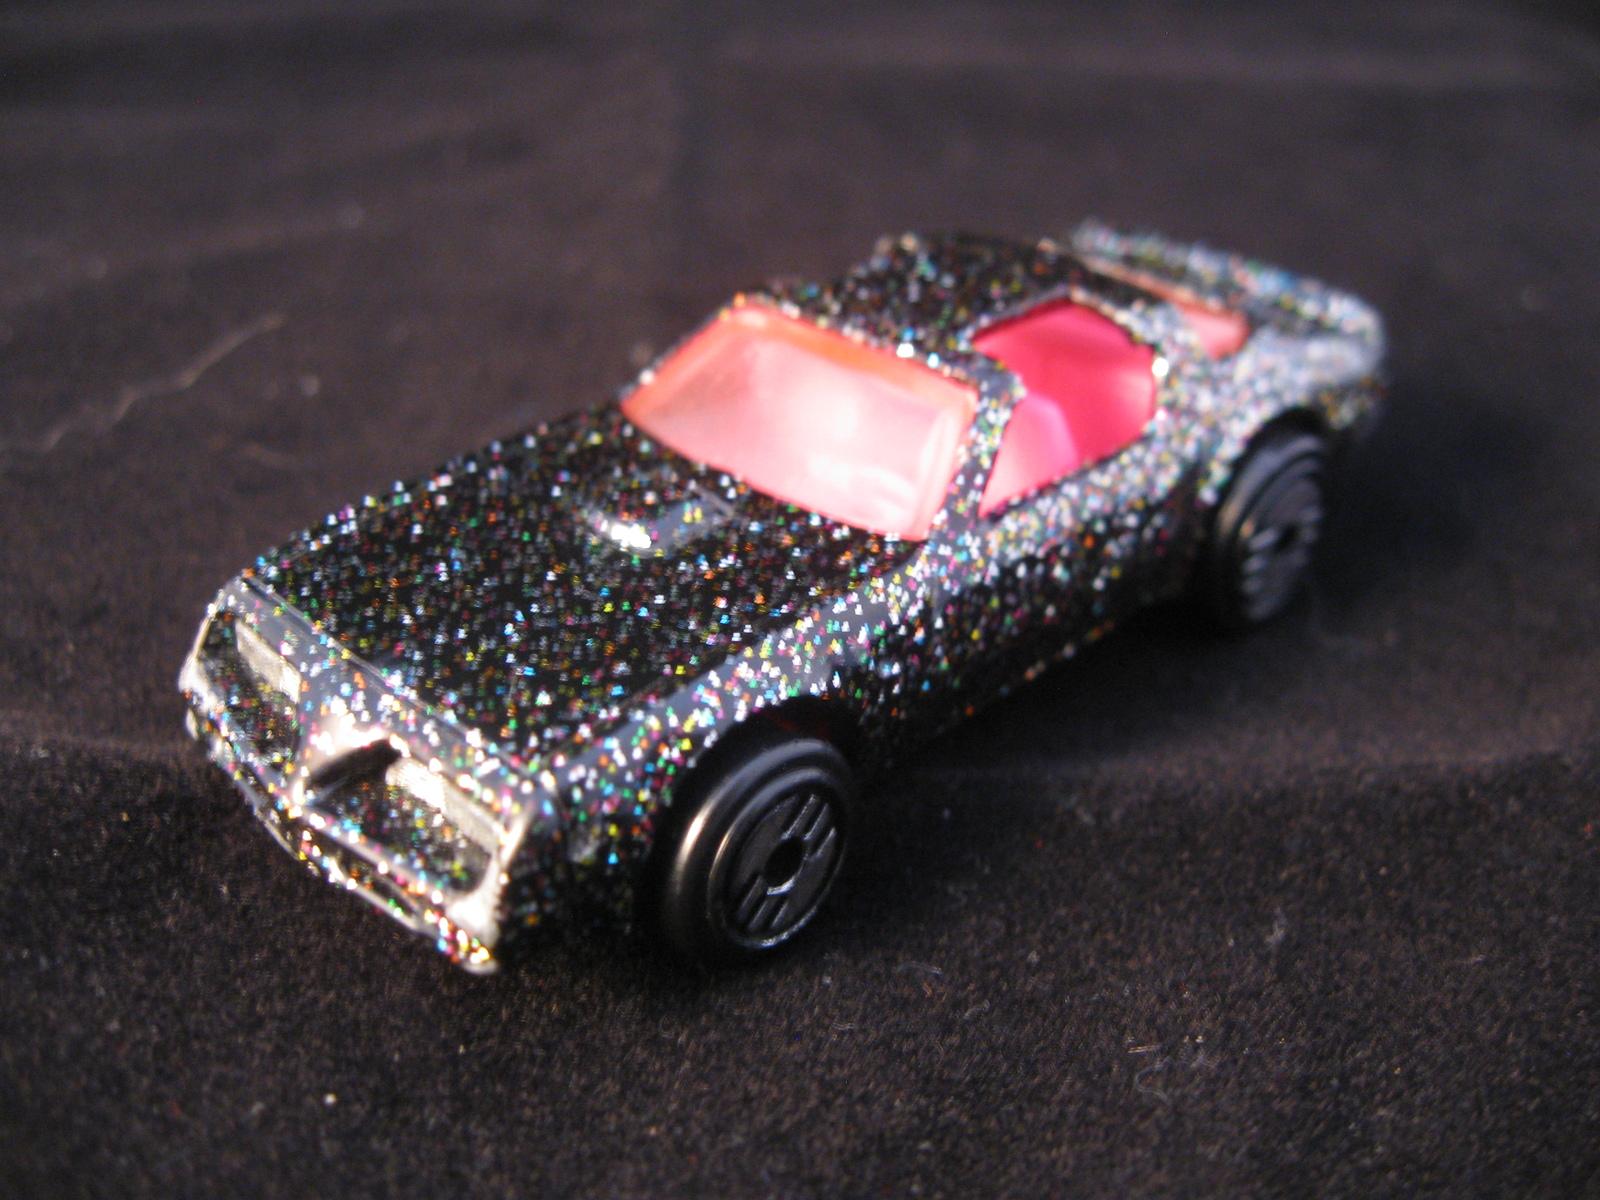 Glitter Paint Job On Car